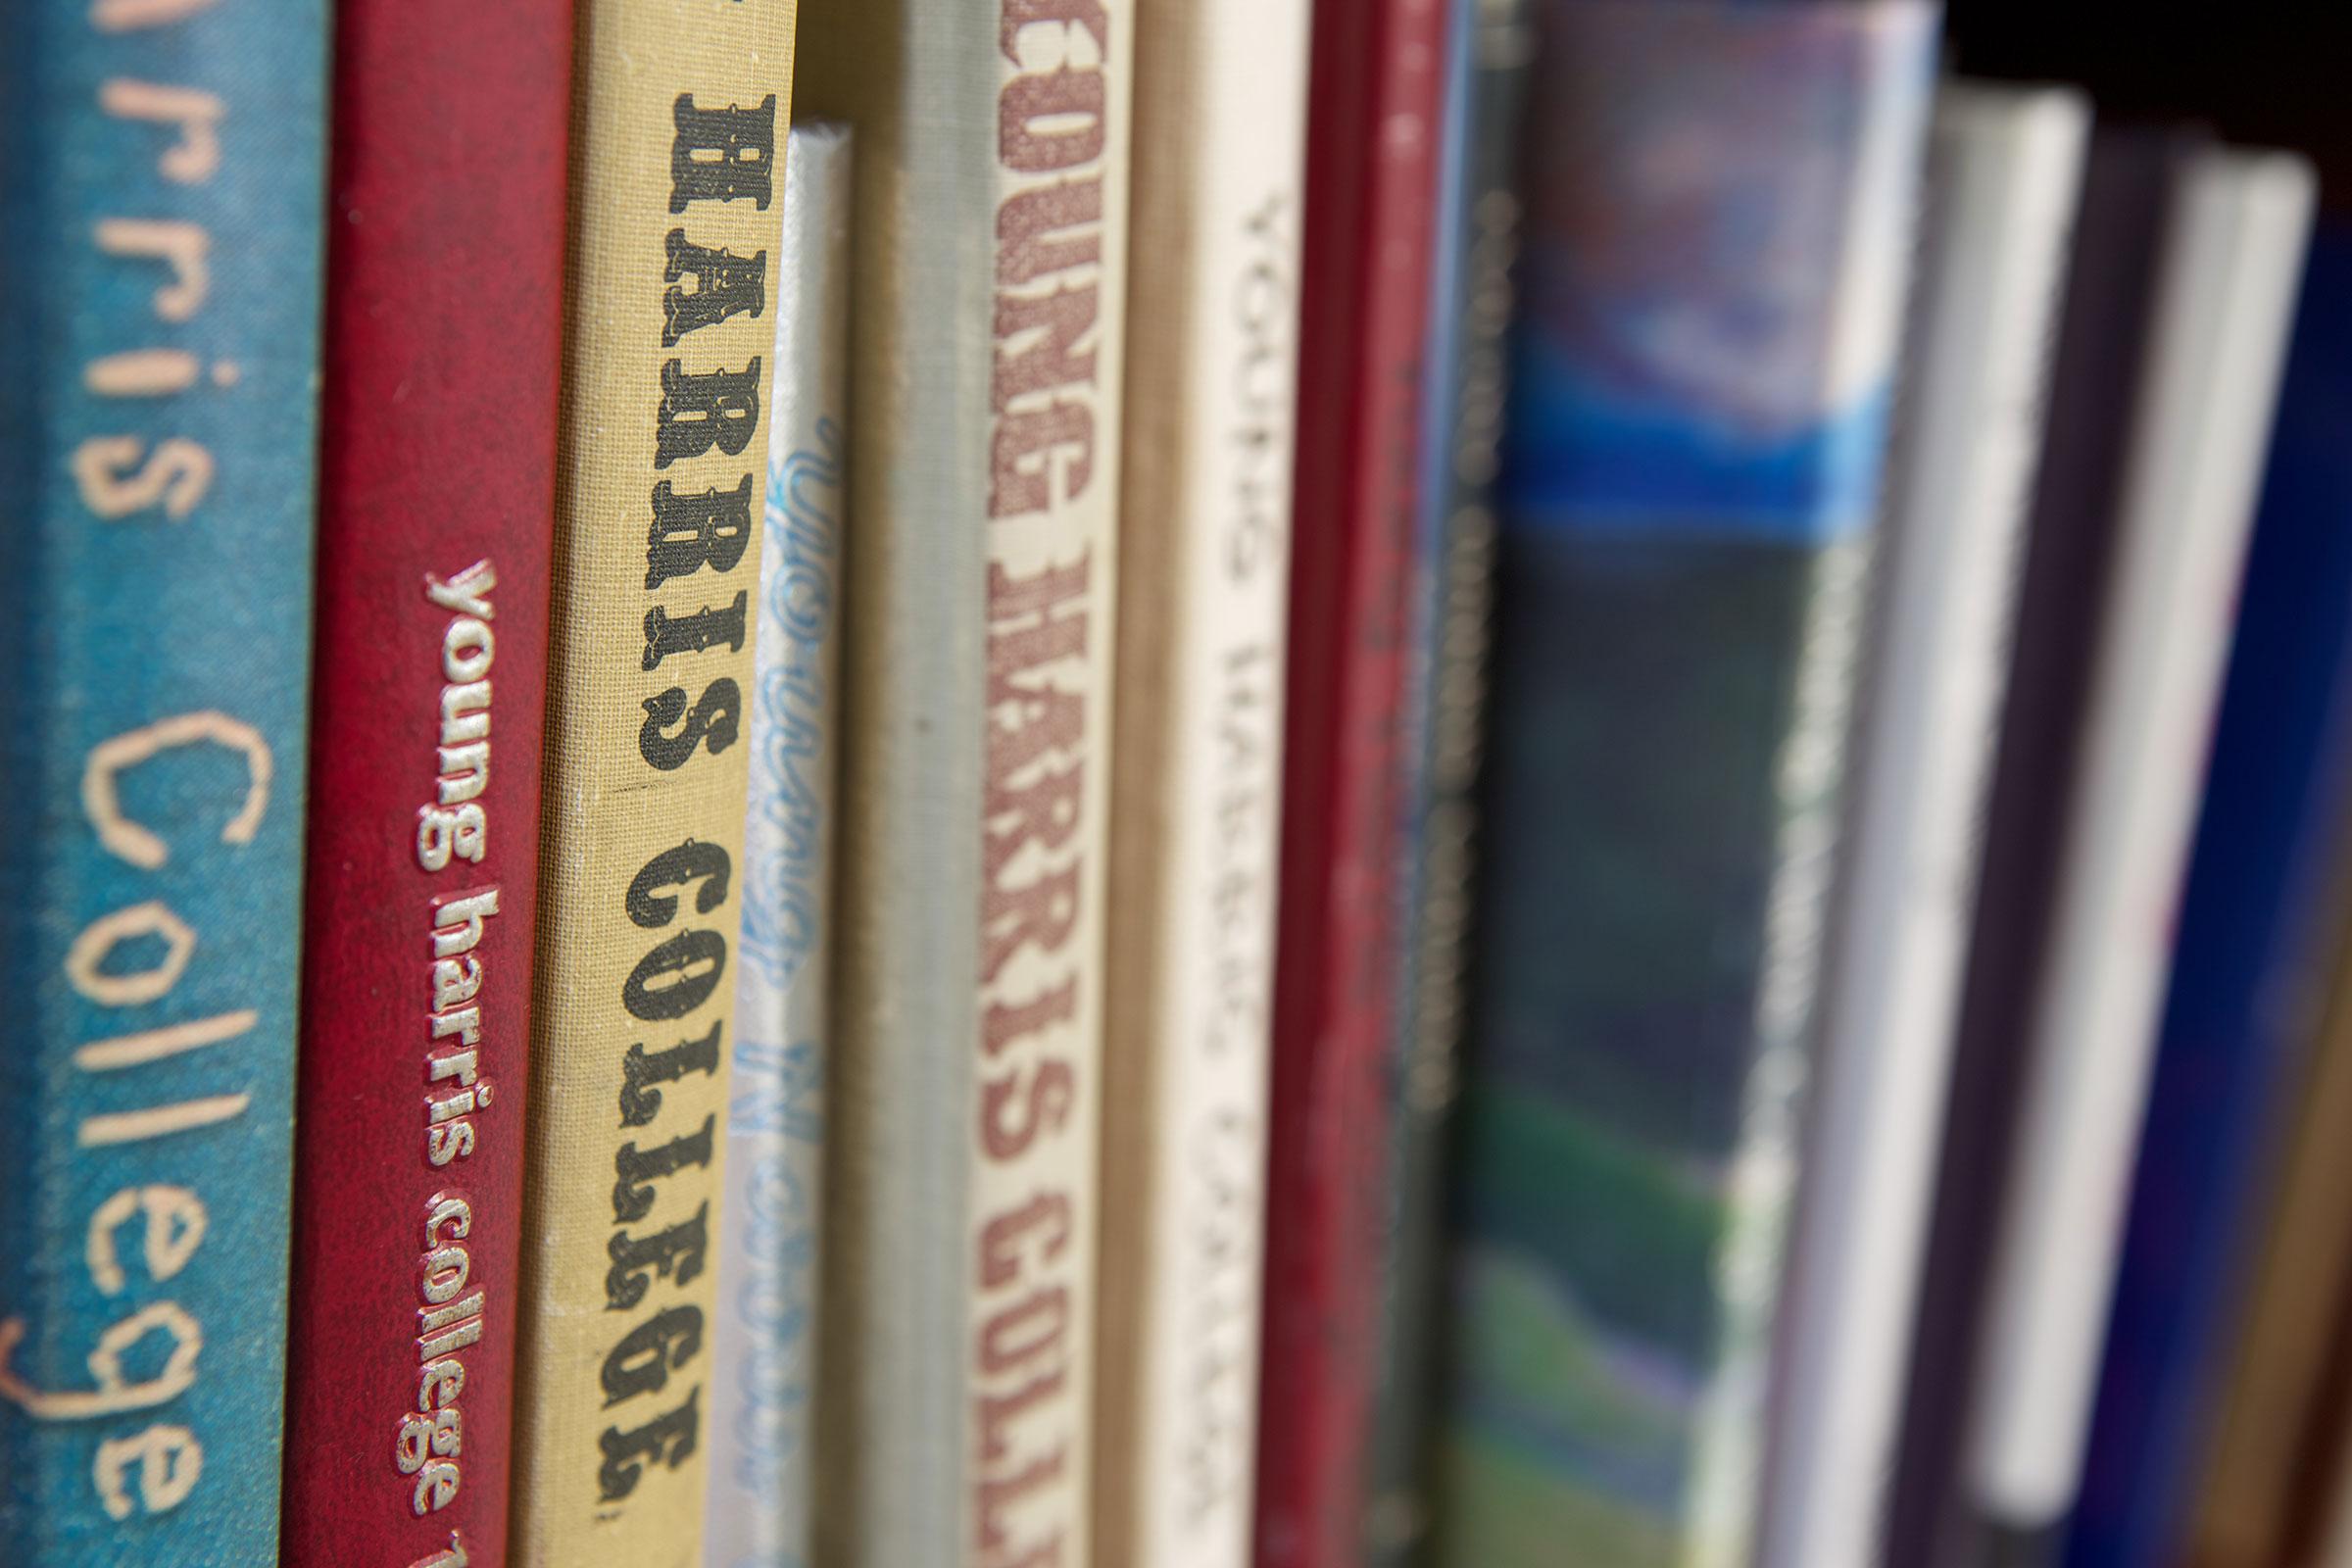 alumni yearbooks